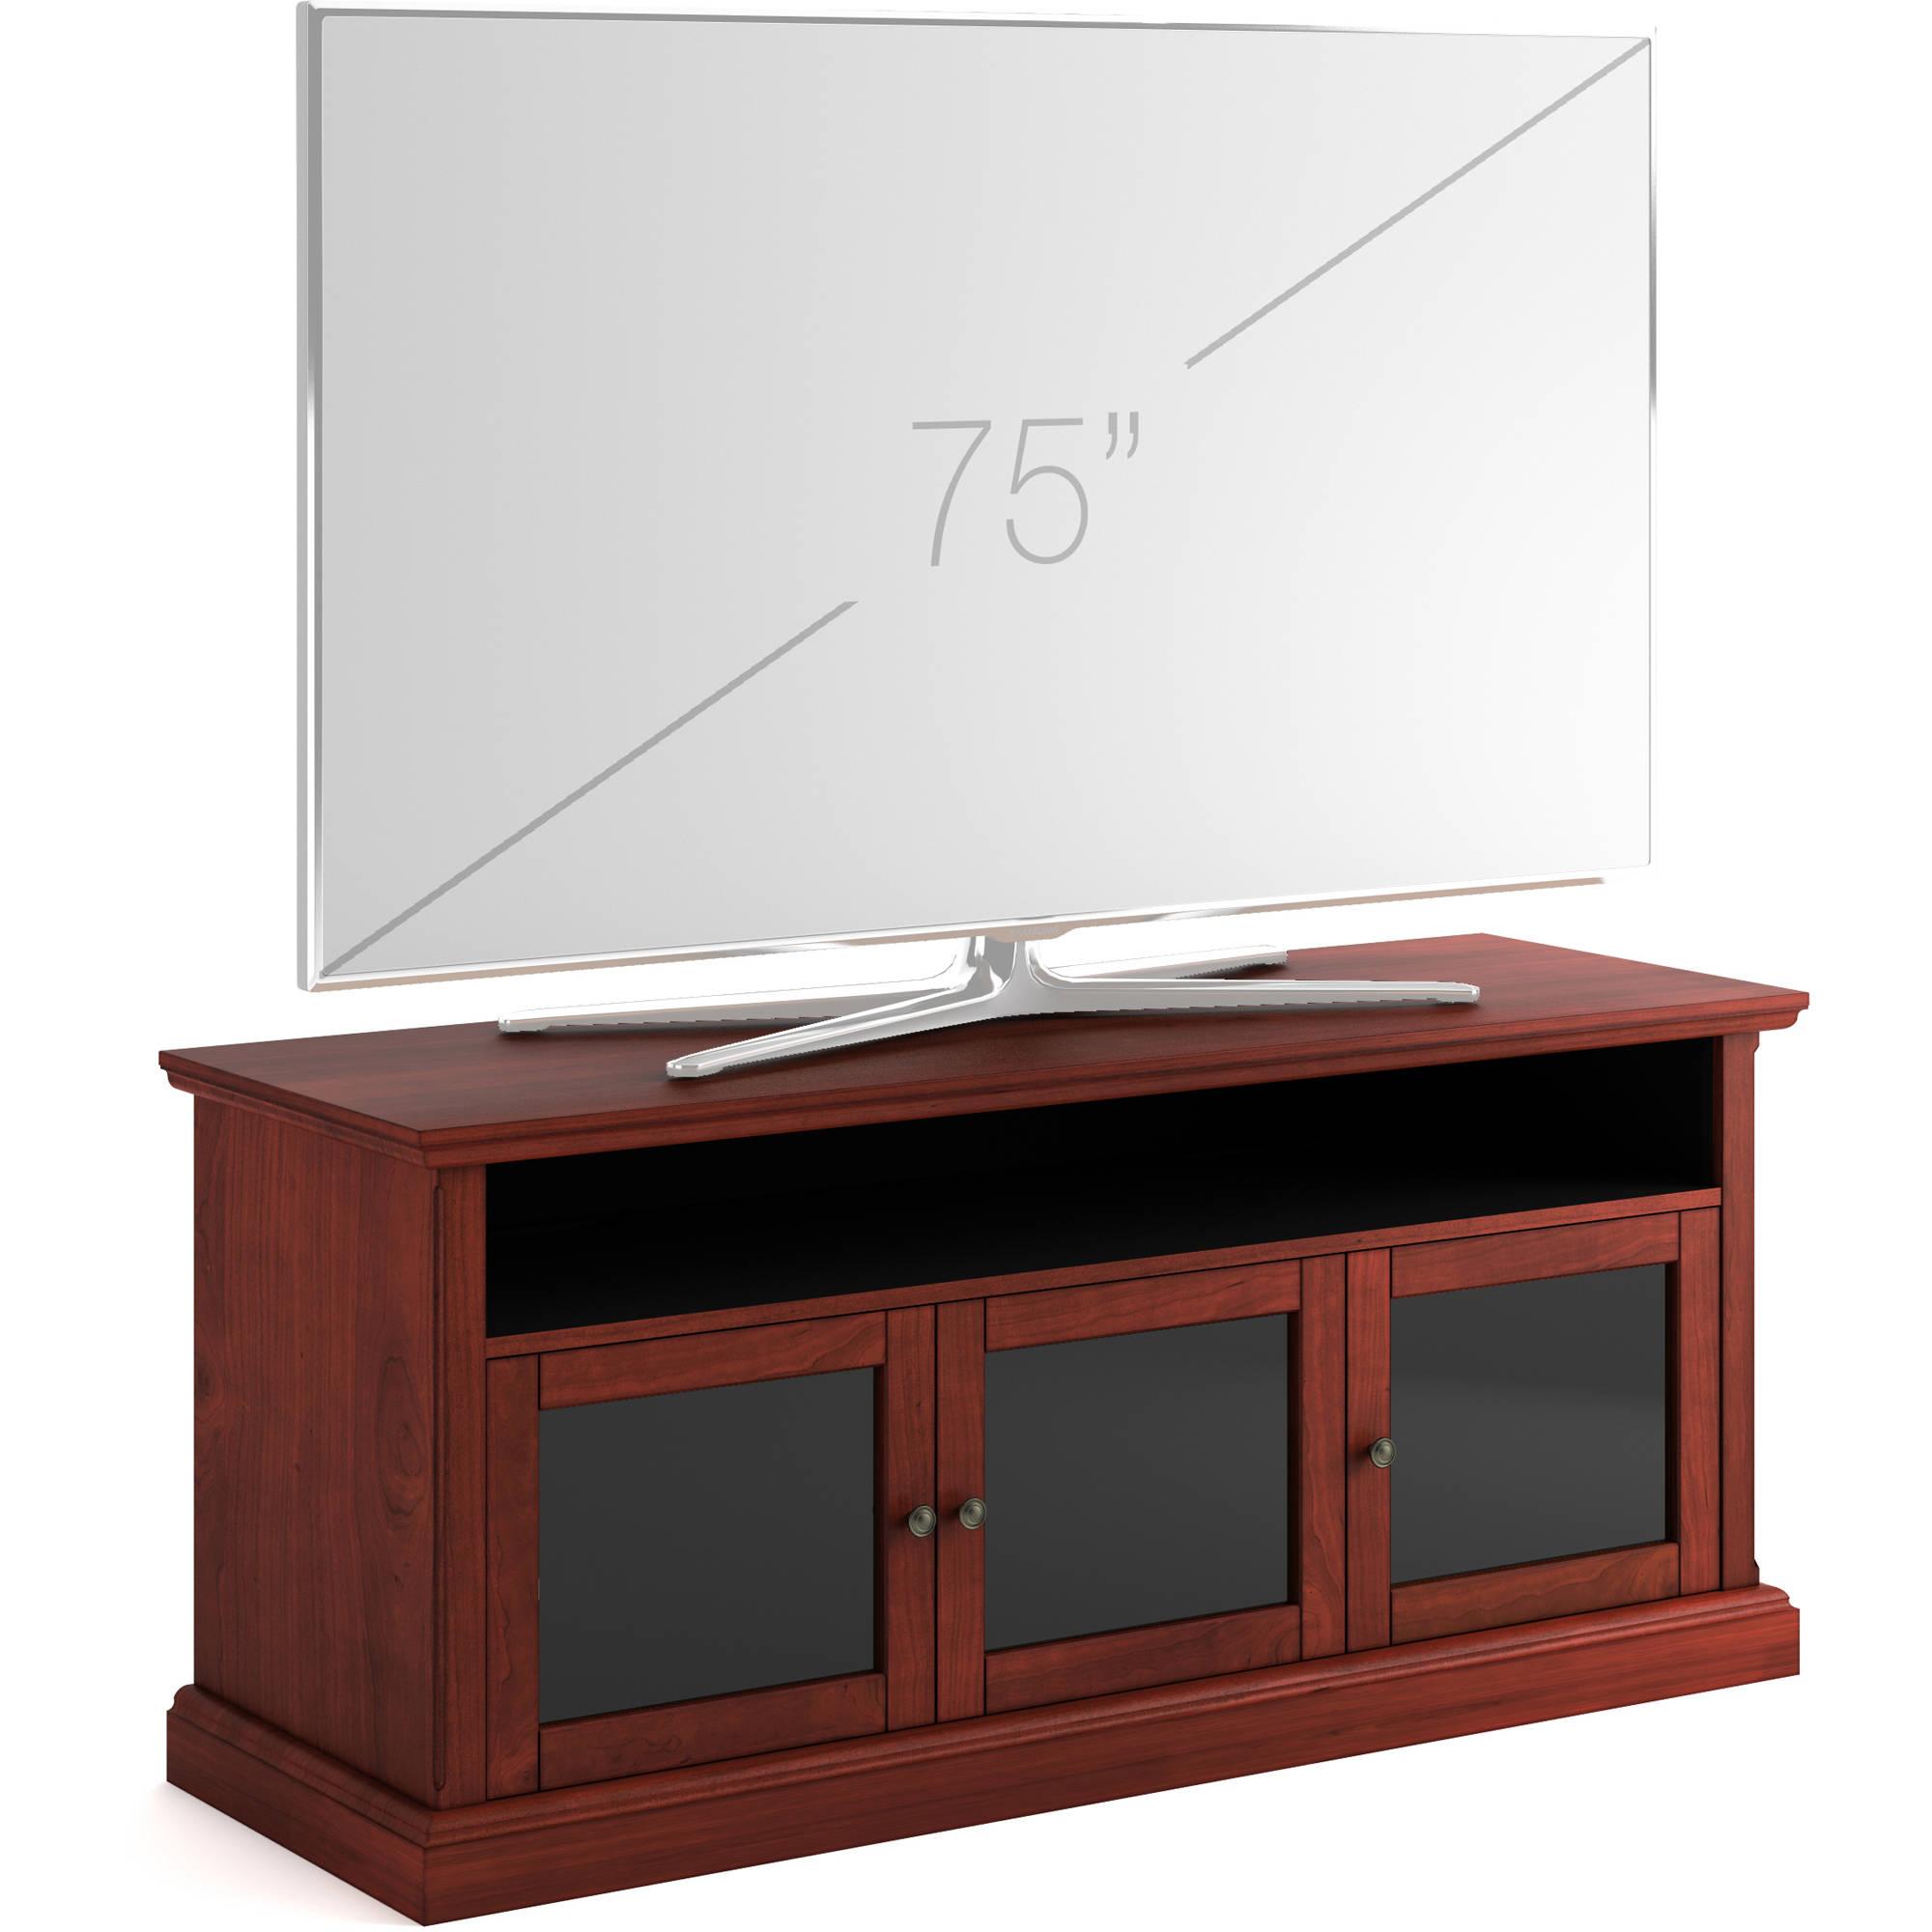 Salamander Designs Audio Video Cabinet In Warm Sdav7 6629 Wc B H